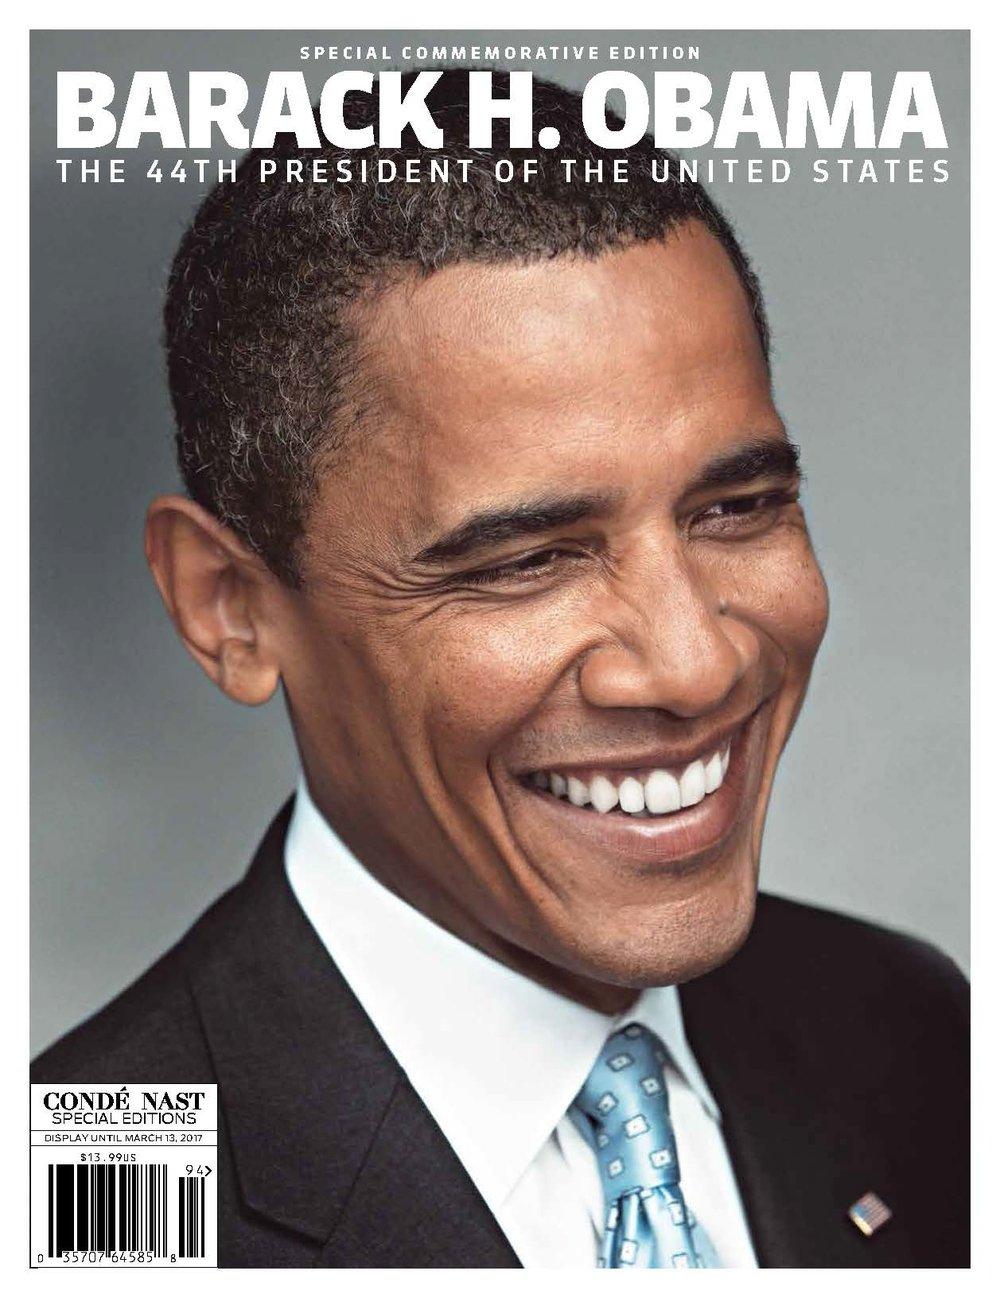 barack_h__obama__the_44th_president_of_the_united_states.jpg